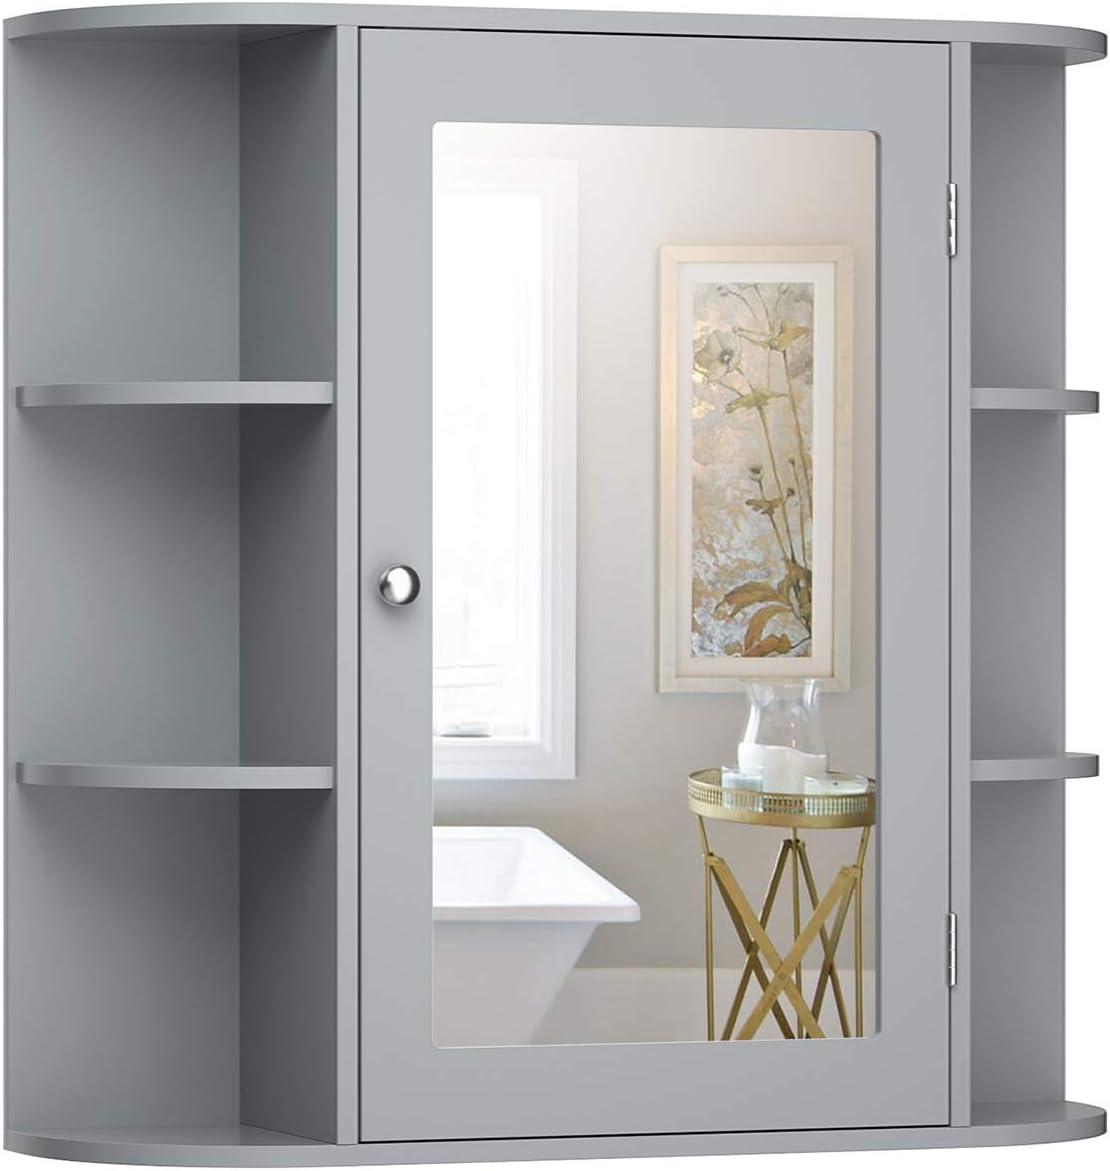 Tangkula Bathroom Medicine Cabinet with Mirror, Wall Mounted Bathroom Storage Cabinet with Mirror Door & Shelves, Mirror Cabinet for Bathroom Living Room, Bathroom Wall Cabinet with Mirror (Gray)